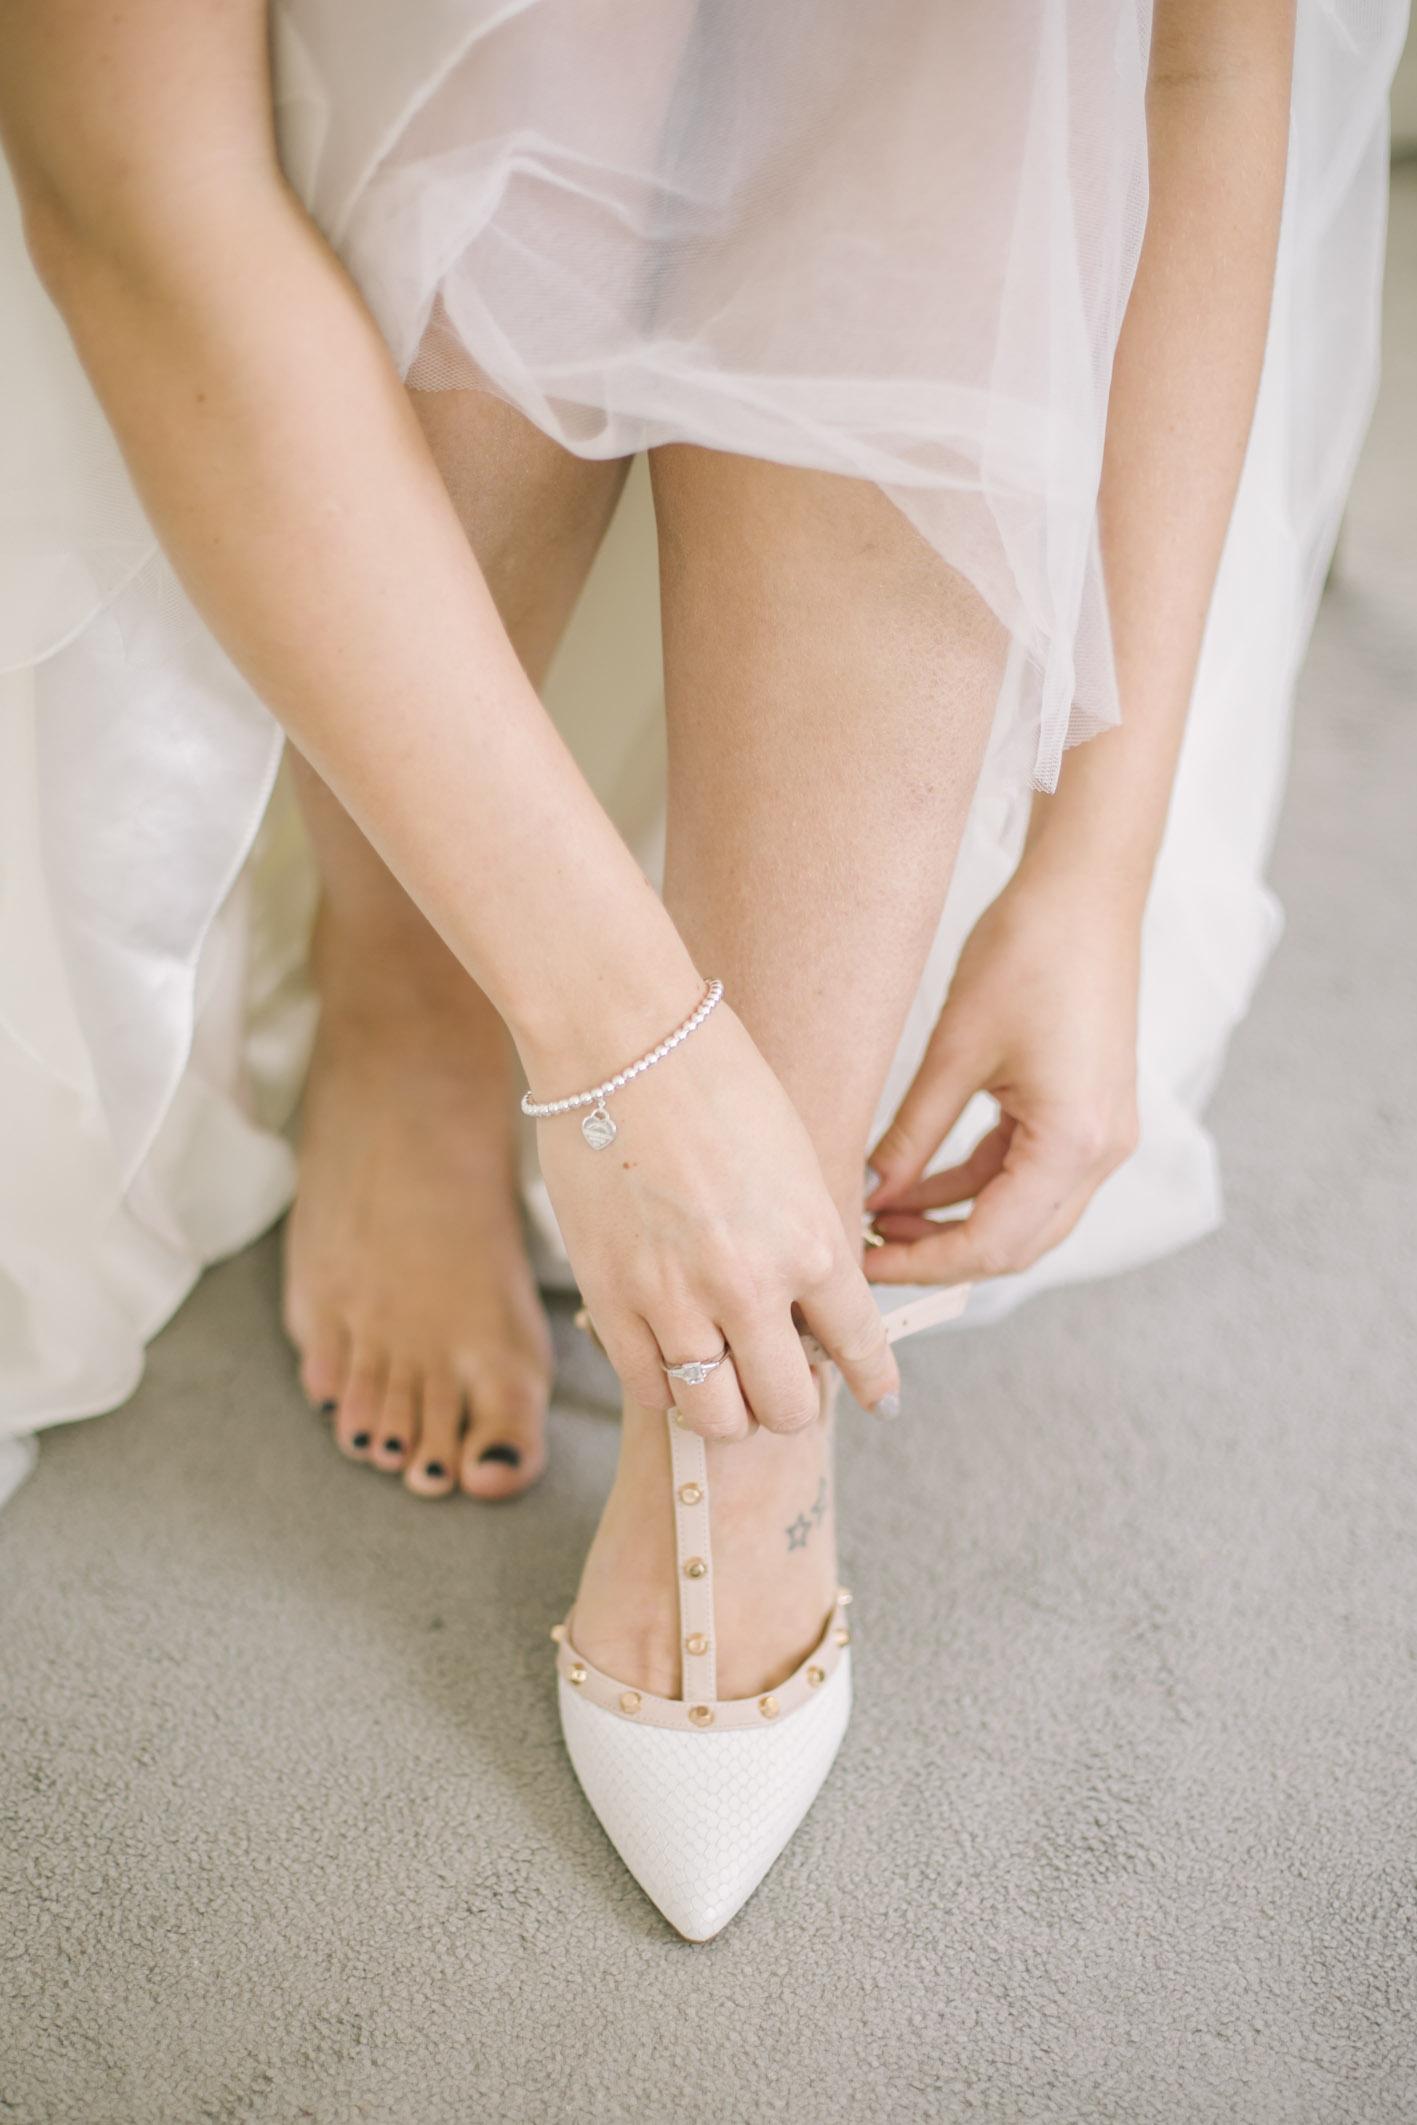 Bride getting ready at Balbirnie House Wedding Photography by Ceranna, Edinburgh based Wedding and Elopement Photographer